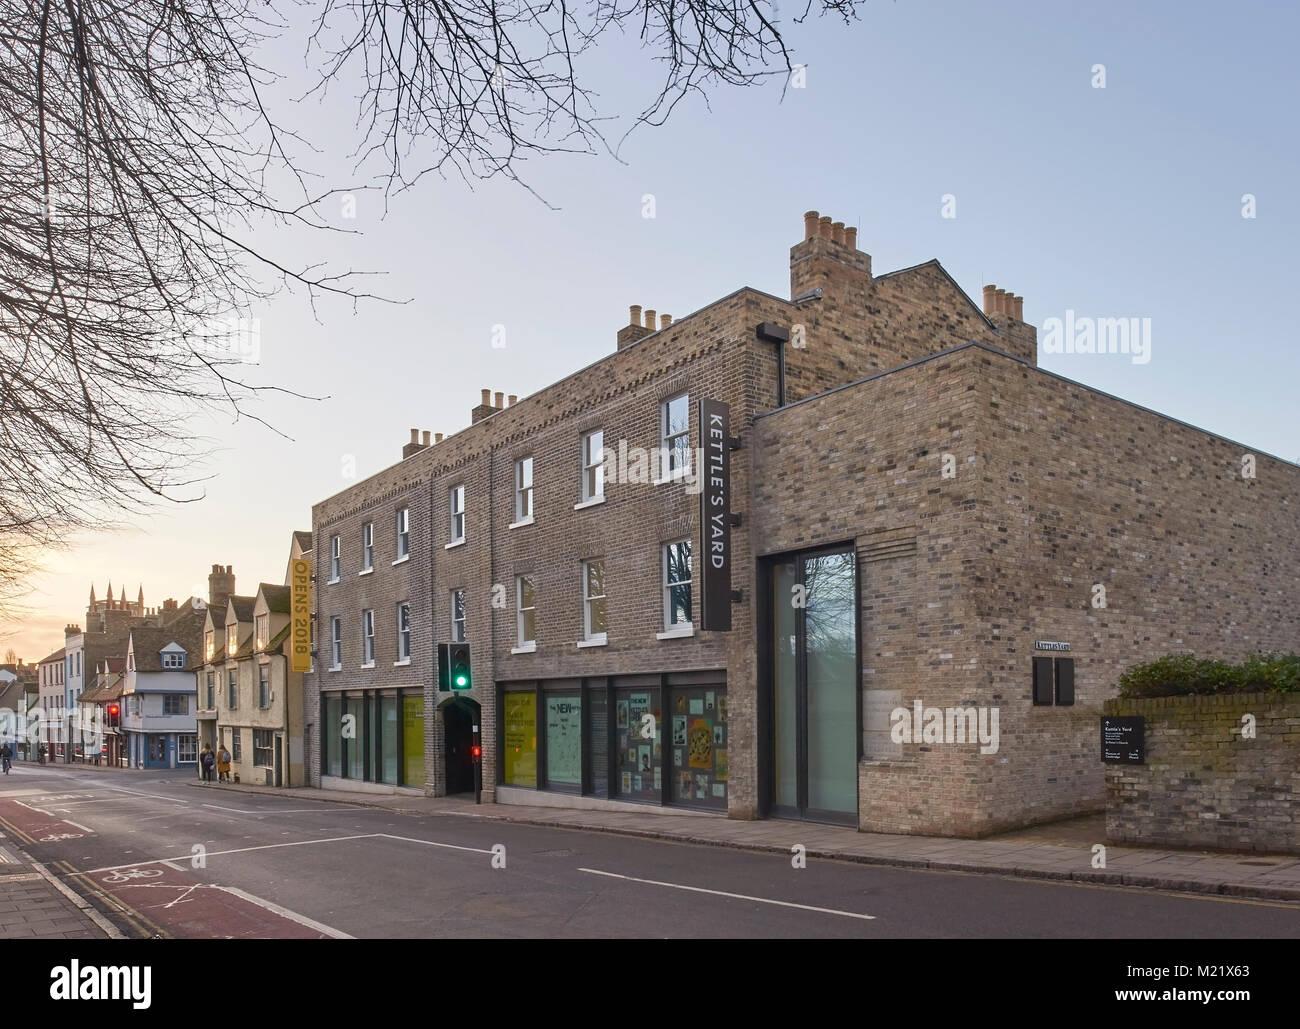 Kettle's Yard, Cambridge art gallery designed by Jamie Fobert Architects 2018 Stock Photo